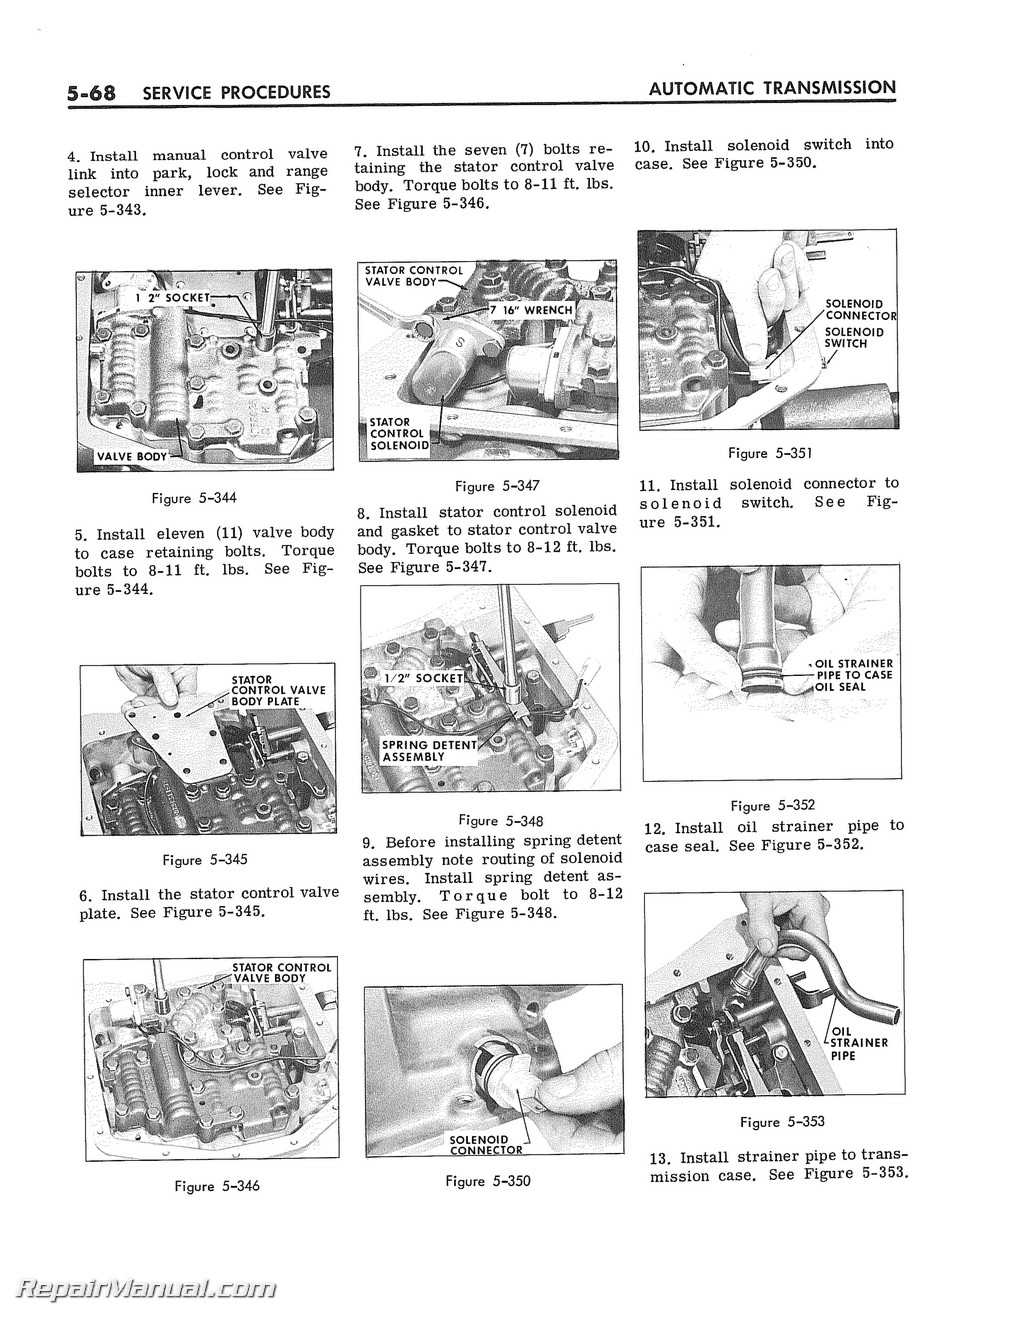 1964 buick super turbine 300 automatic transmission service manual rh repairmanual com automatic transmission repair manual pdf automatic transmission workshop manual